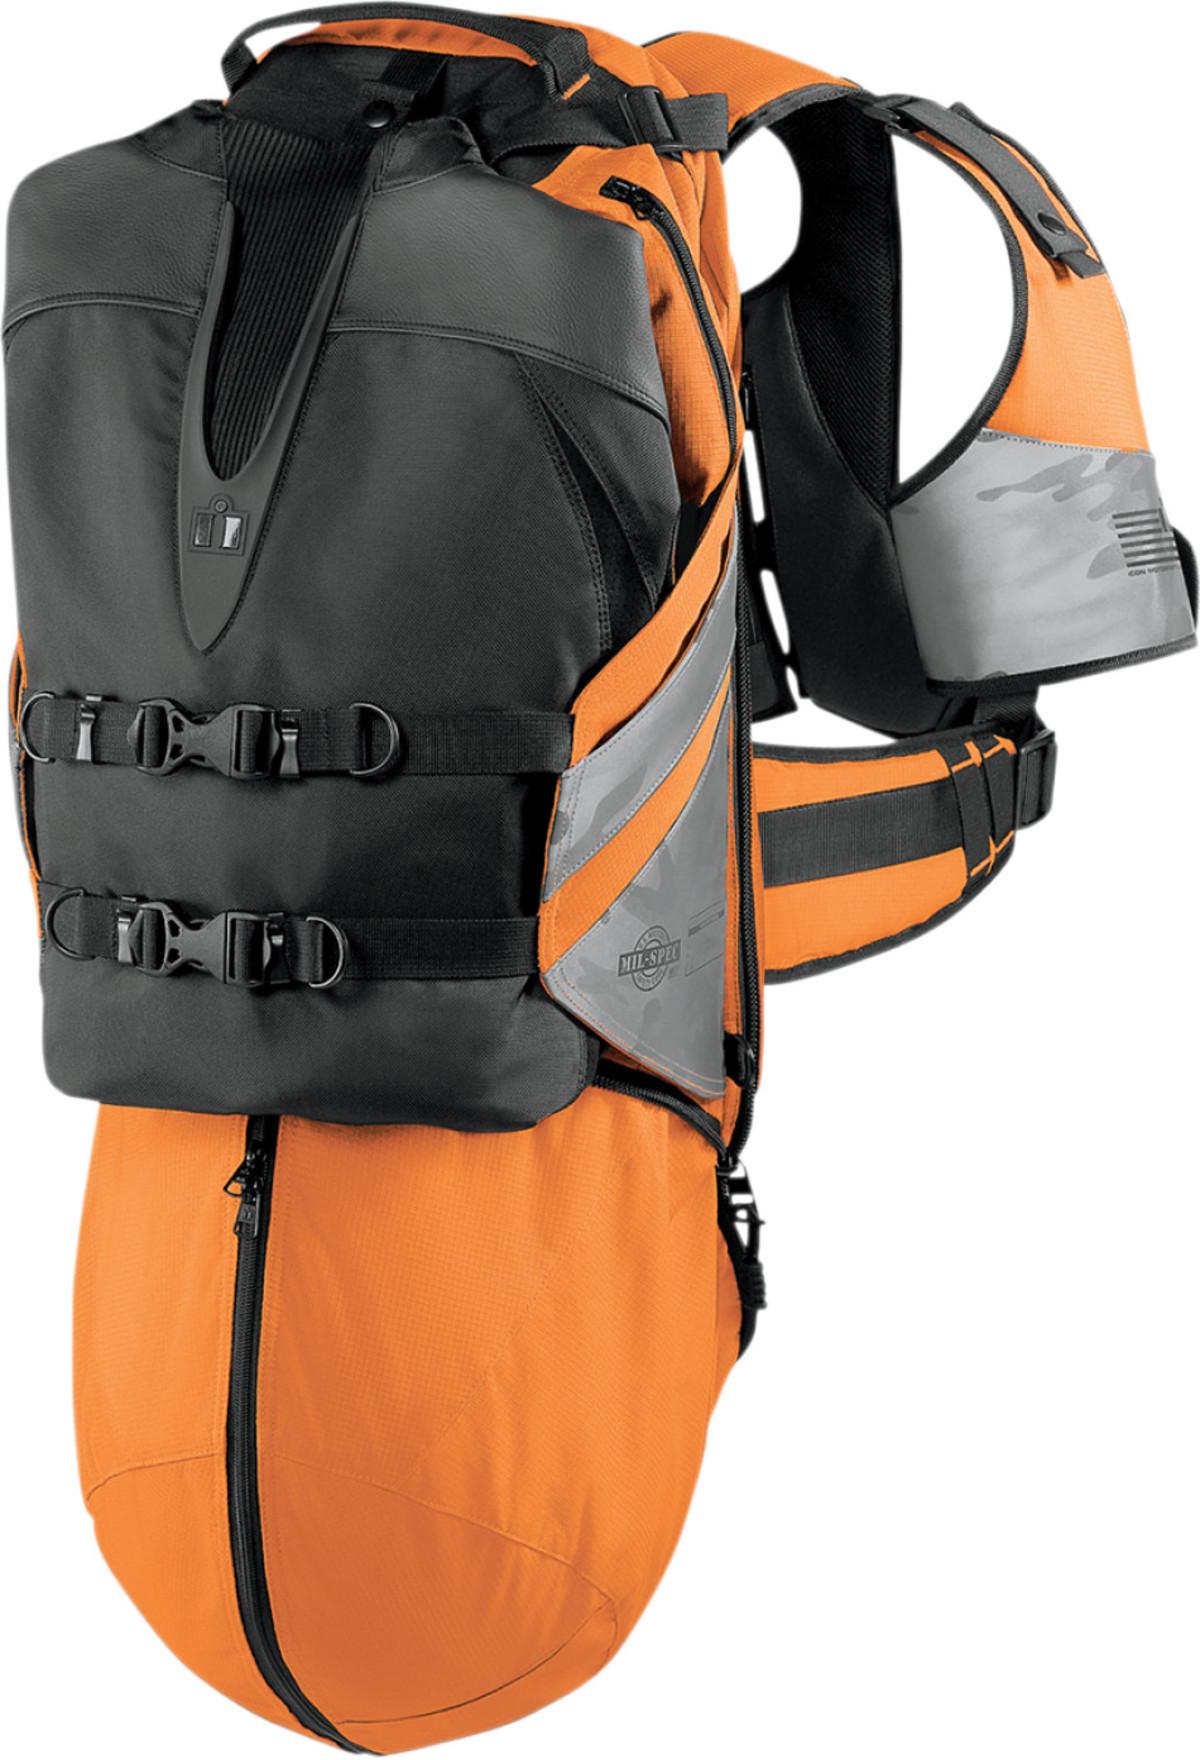 ICON SQUAD II 2 PACK MOTORCYCLE BACKPACK BAG MIL SPEC HI